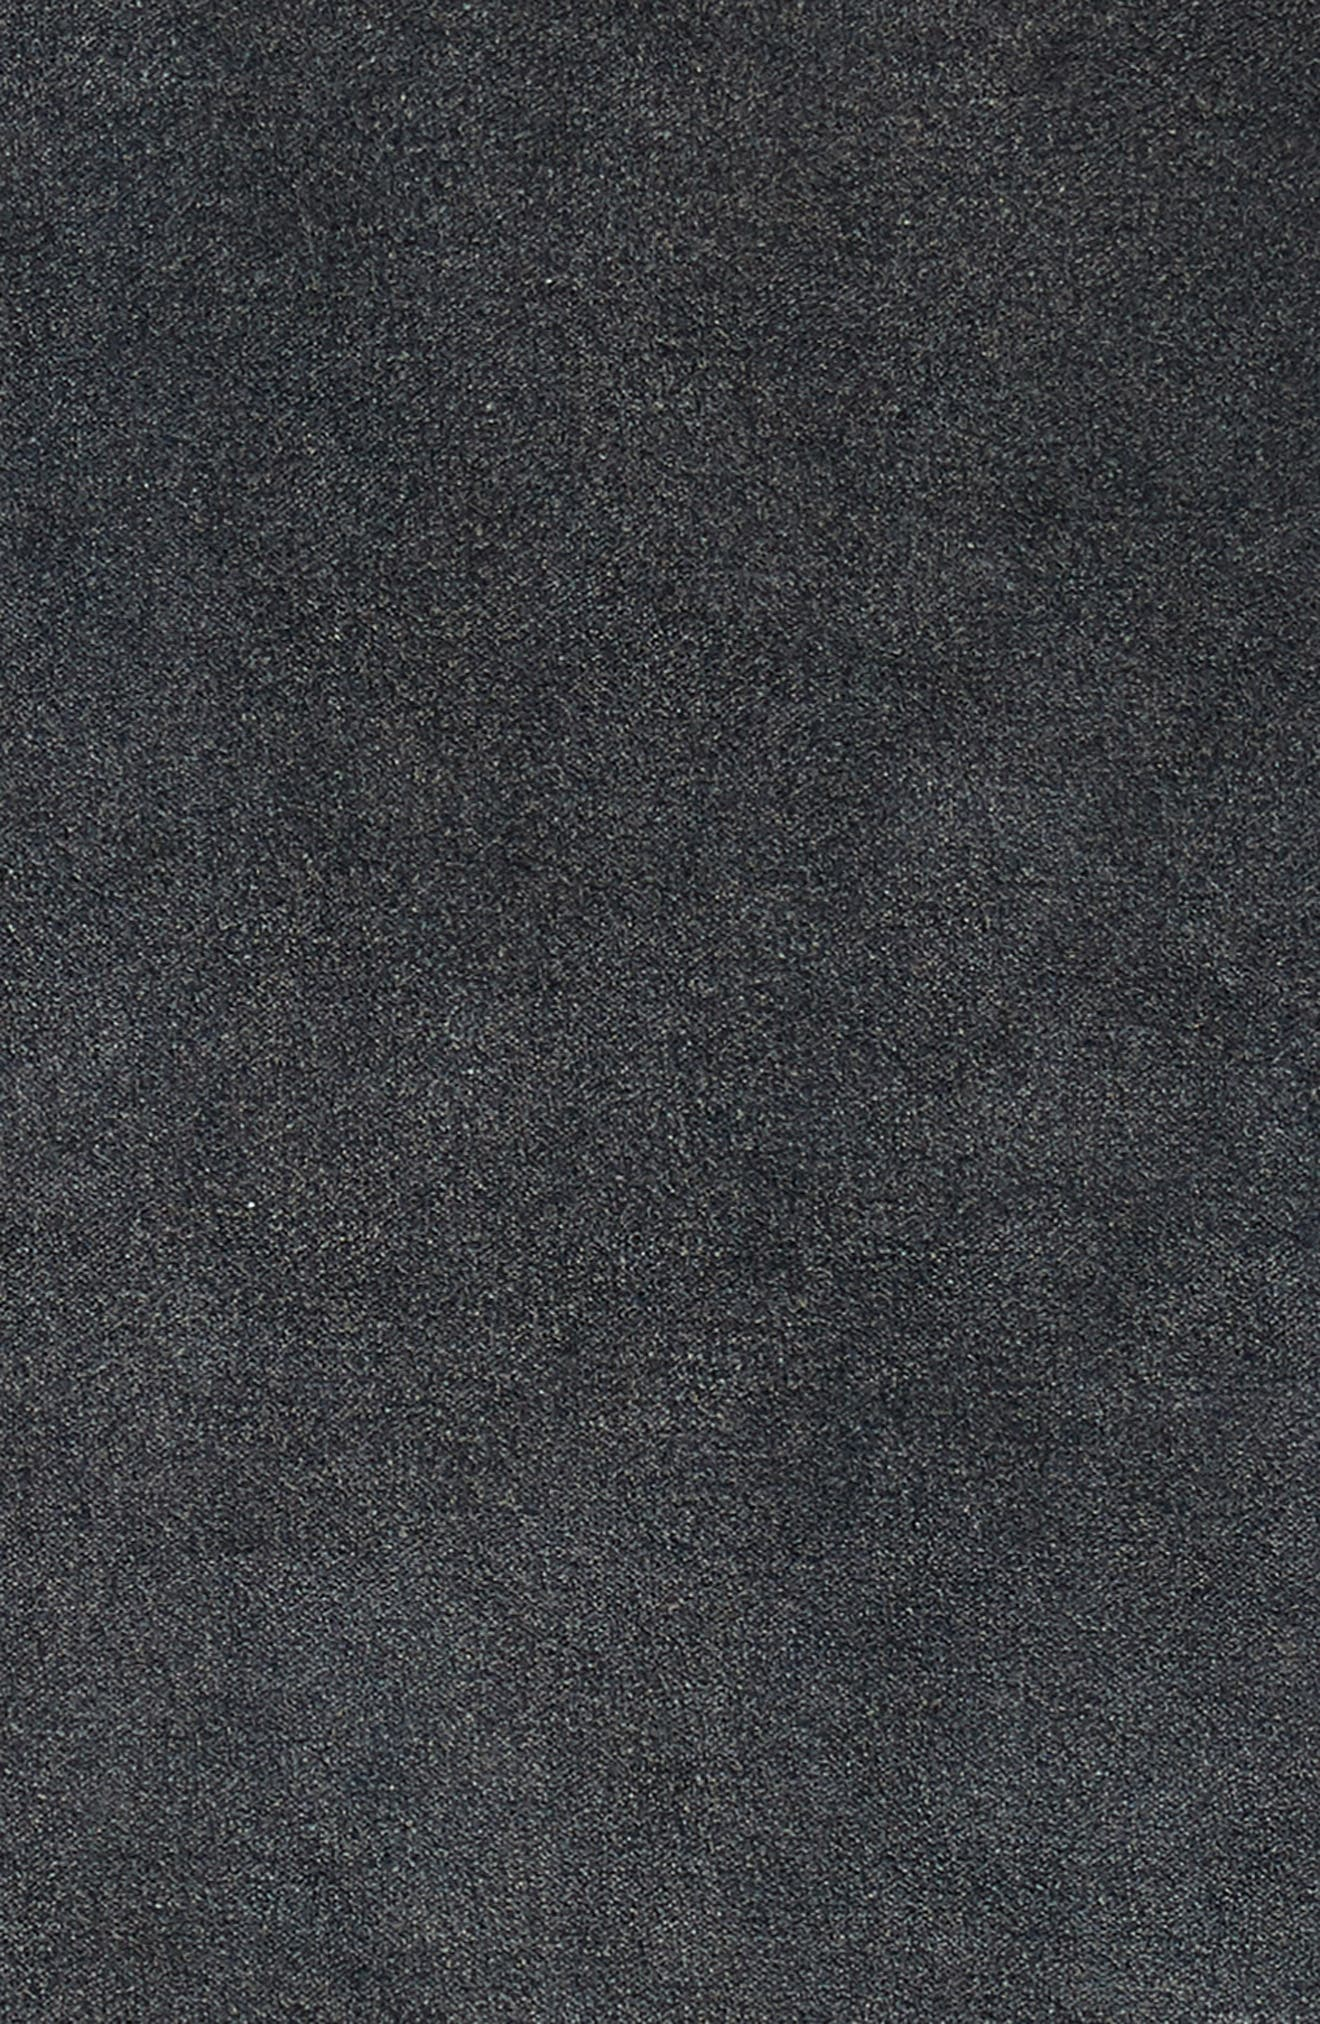 Stonewash Velvet Accent Pillow,                             Alternate thumbnail 3, color,                             NAVY BLUE